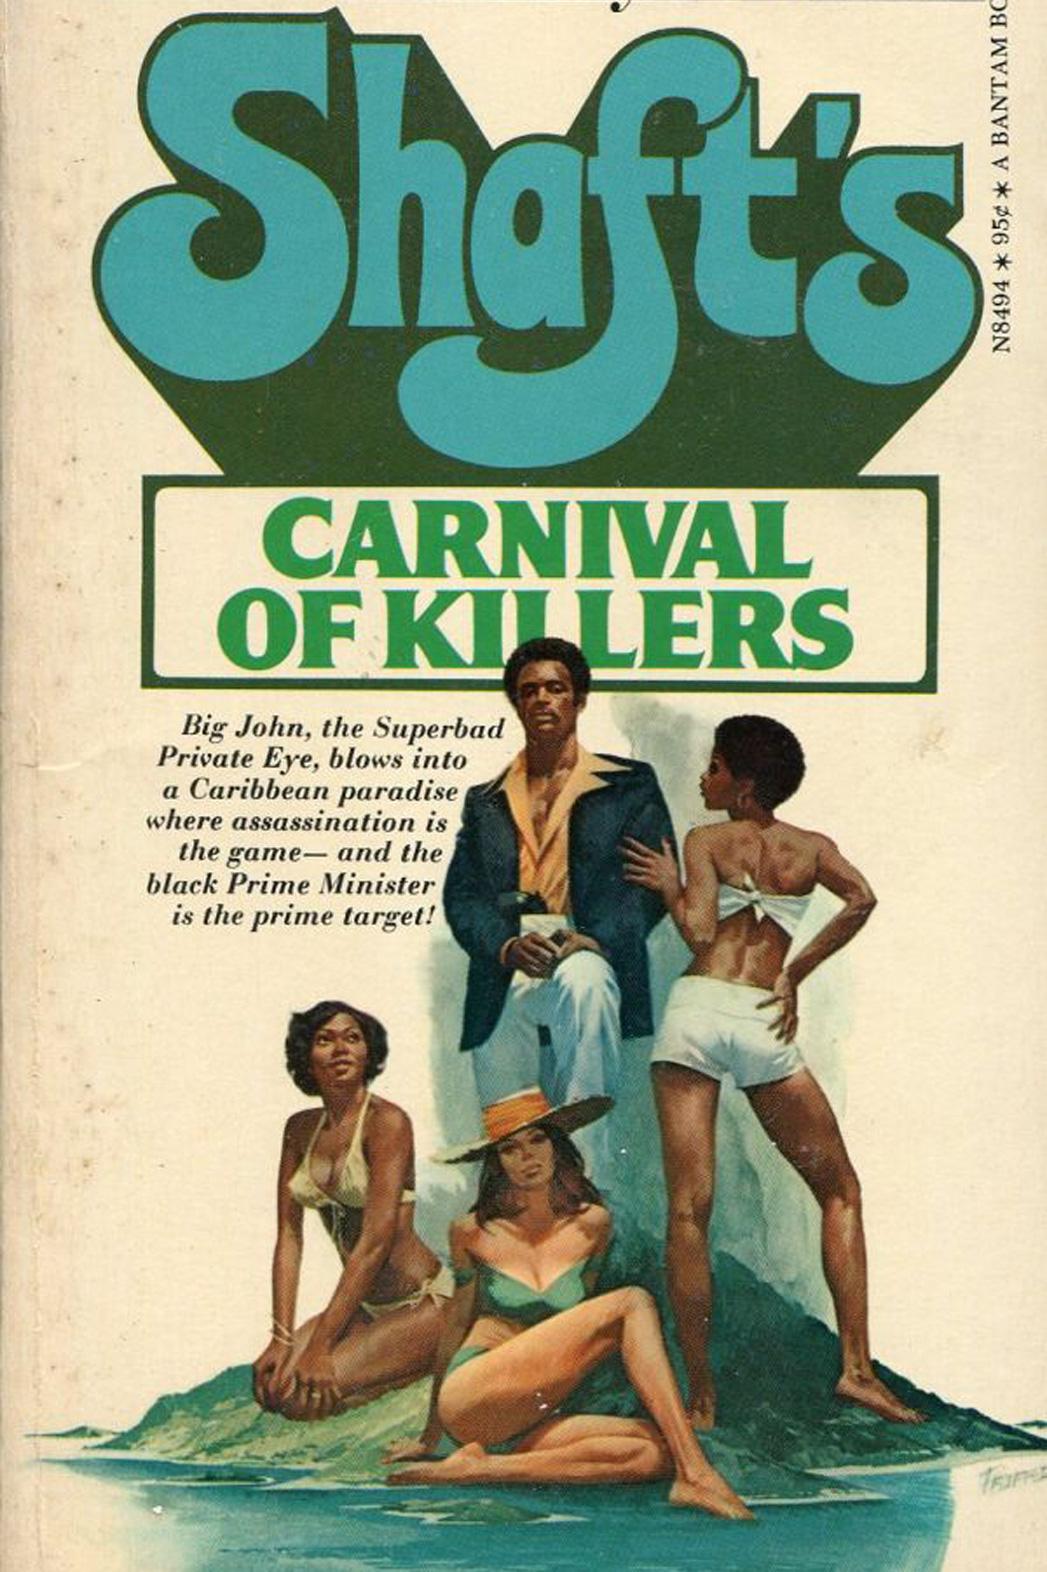 Shaft's Carnival of Killers - P 2014